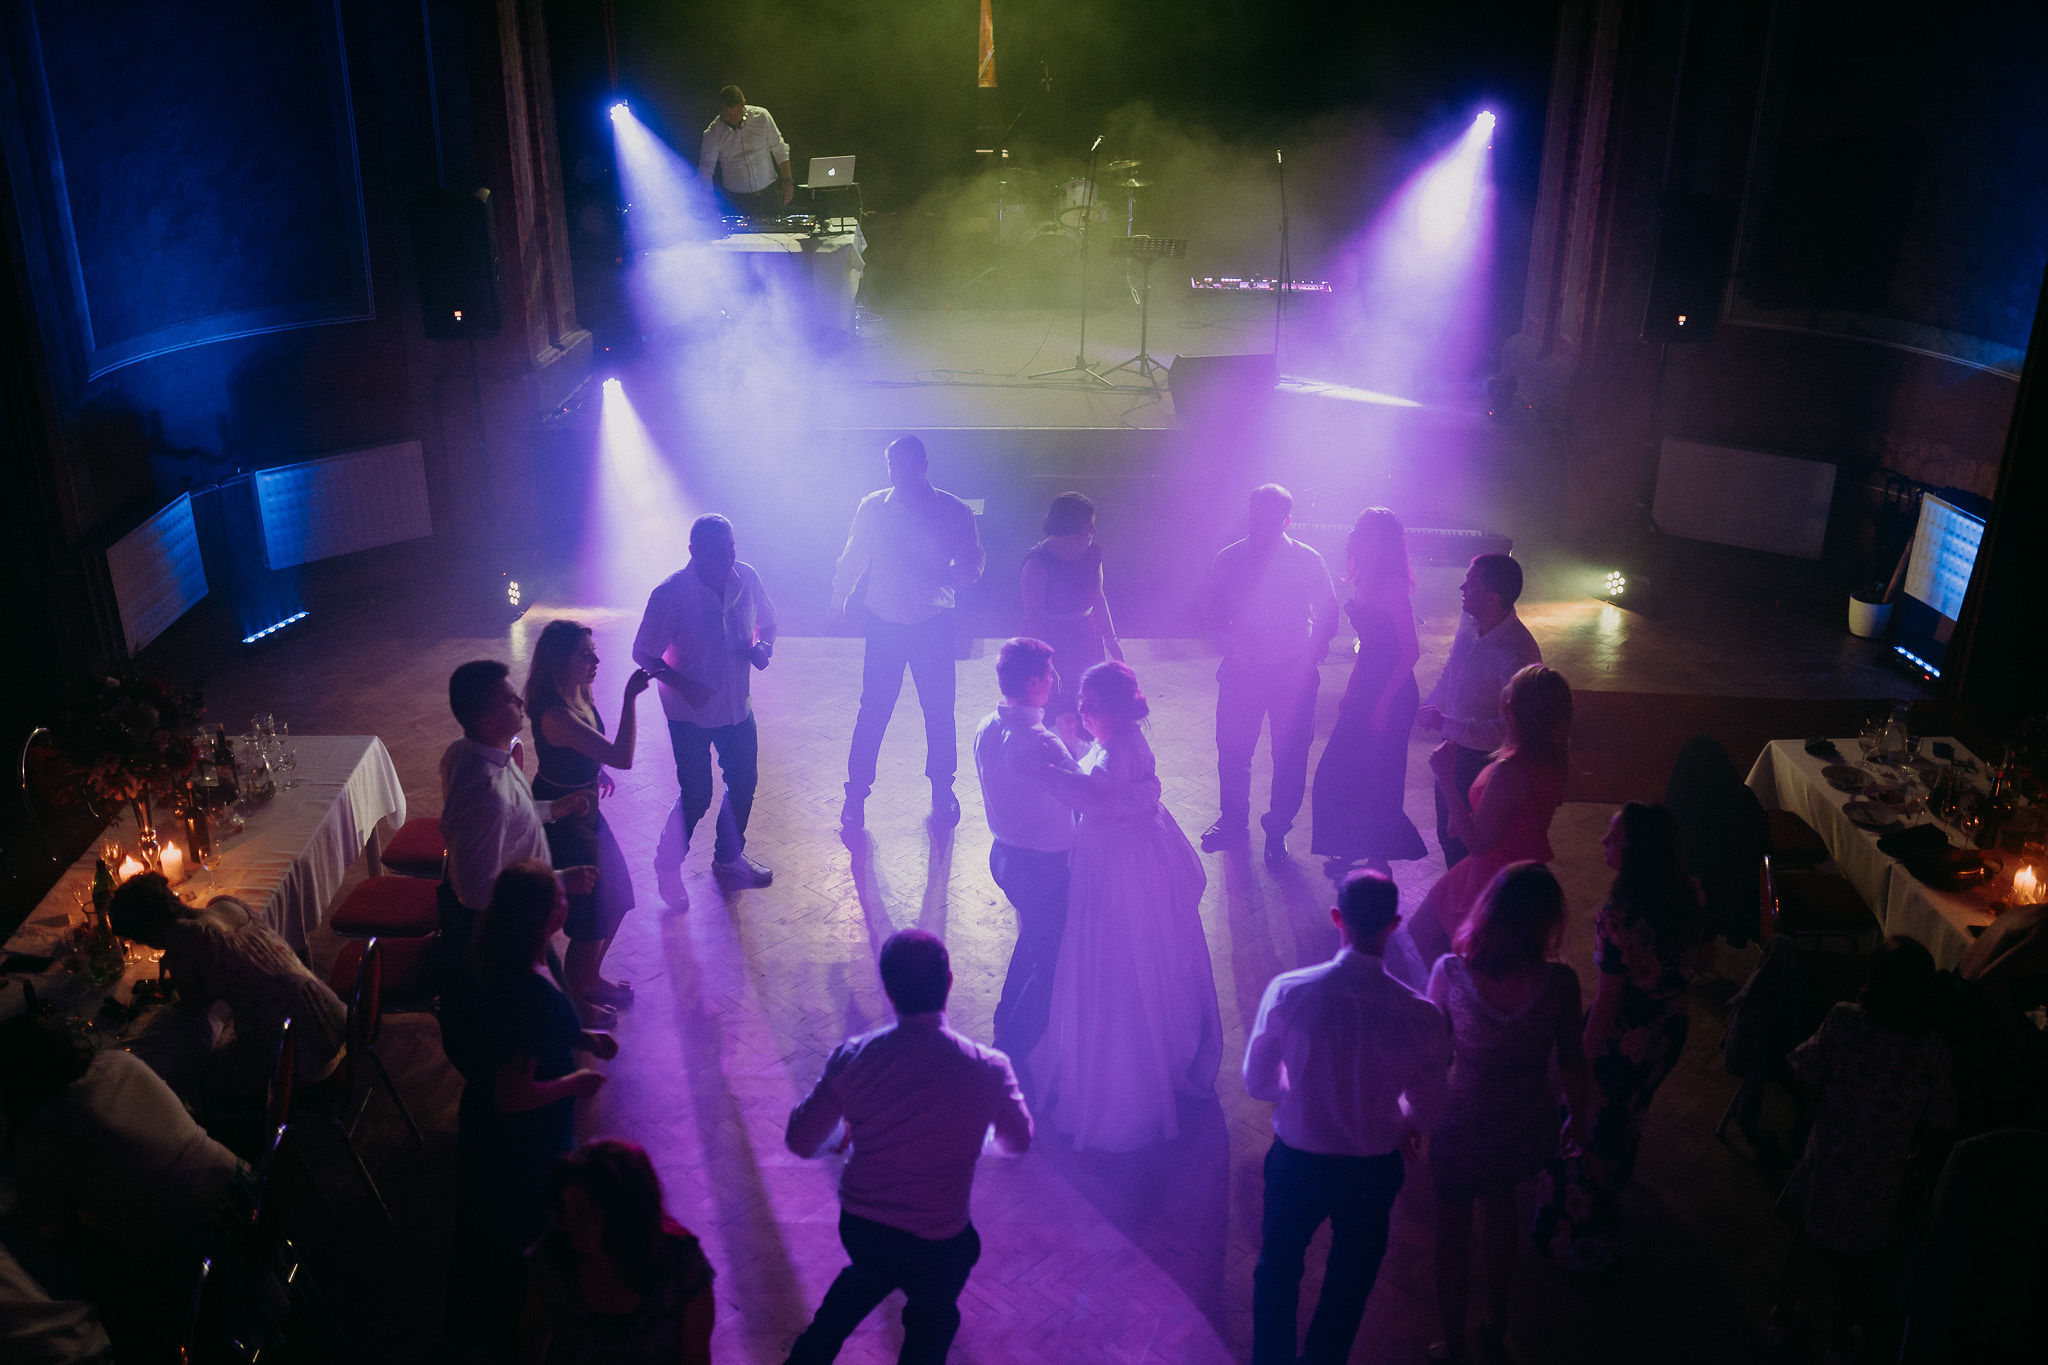 Svadba Hlohovec, Empirove divadlo 03 #svadobnyDJ, #djanasvadbu, #svadba, #svadbahlohovec, #Hlohovec #DJAnavi, #empirovedivadlo